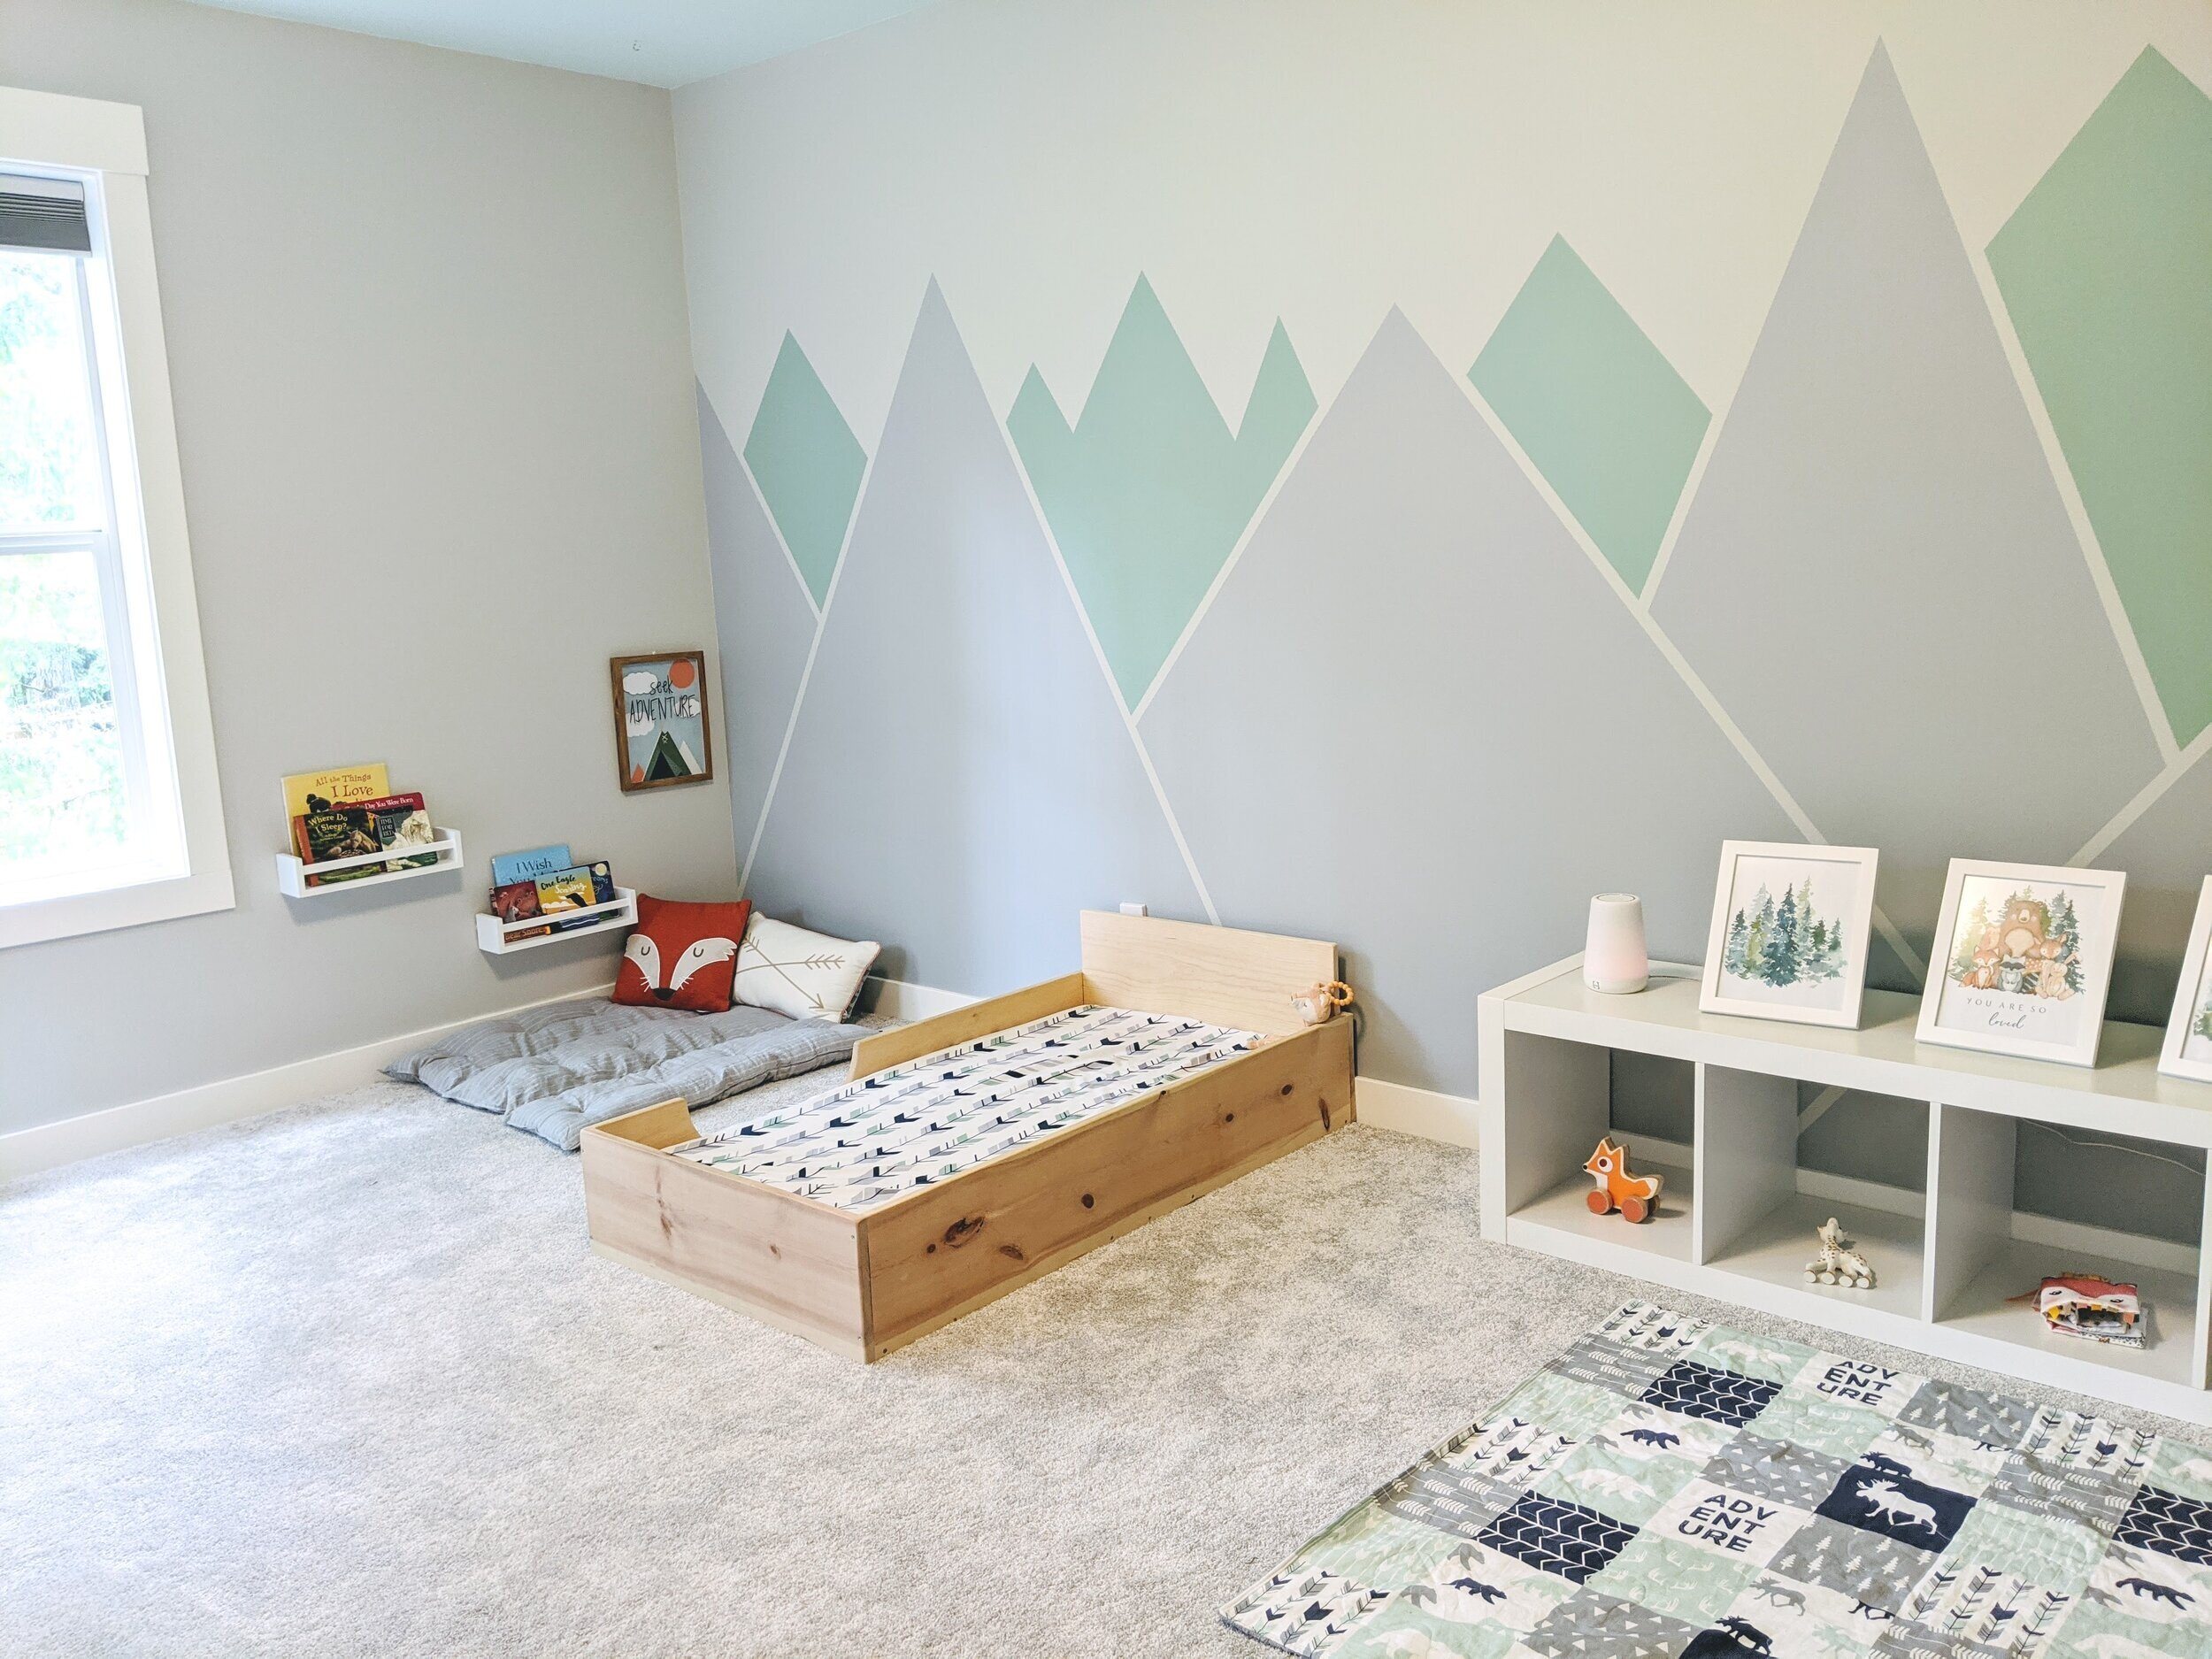 Floor Bed Blog Montessori In Real Life